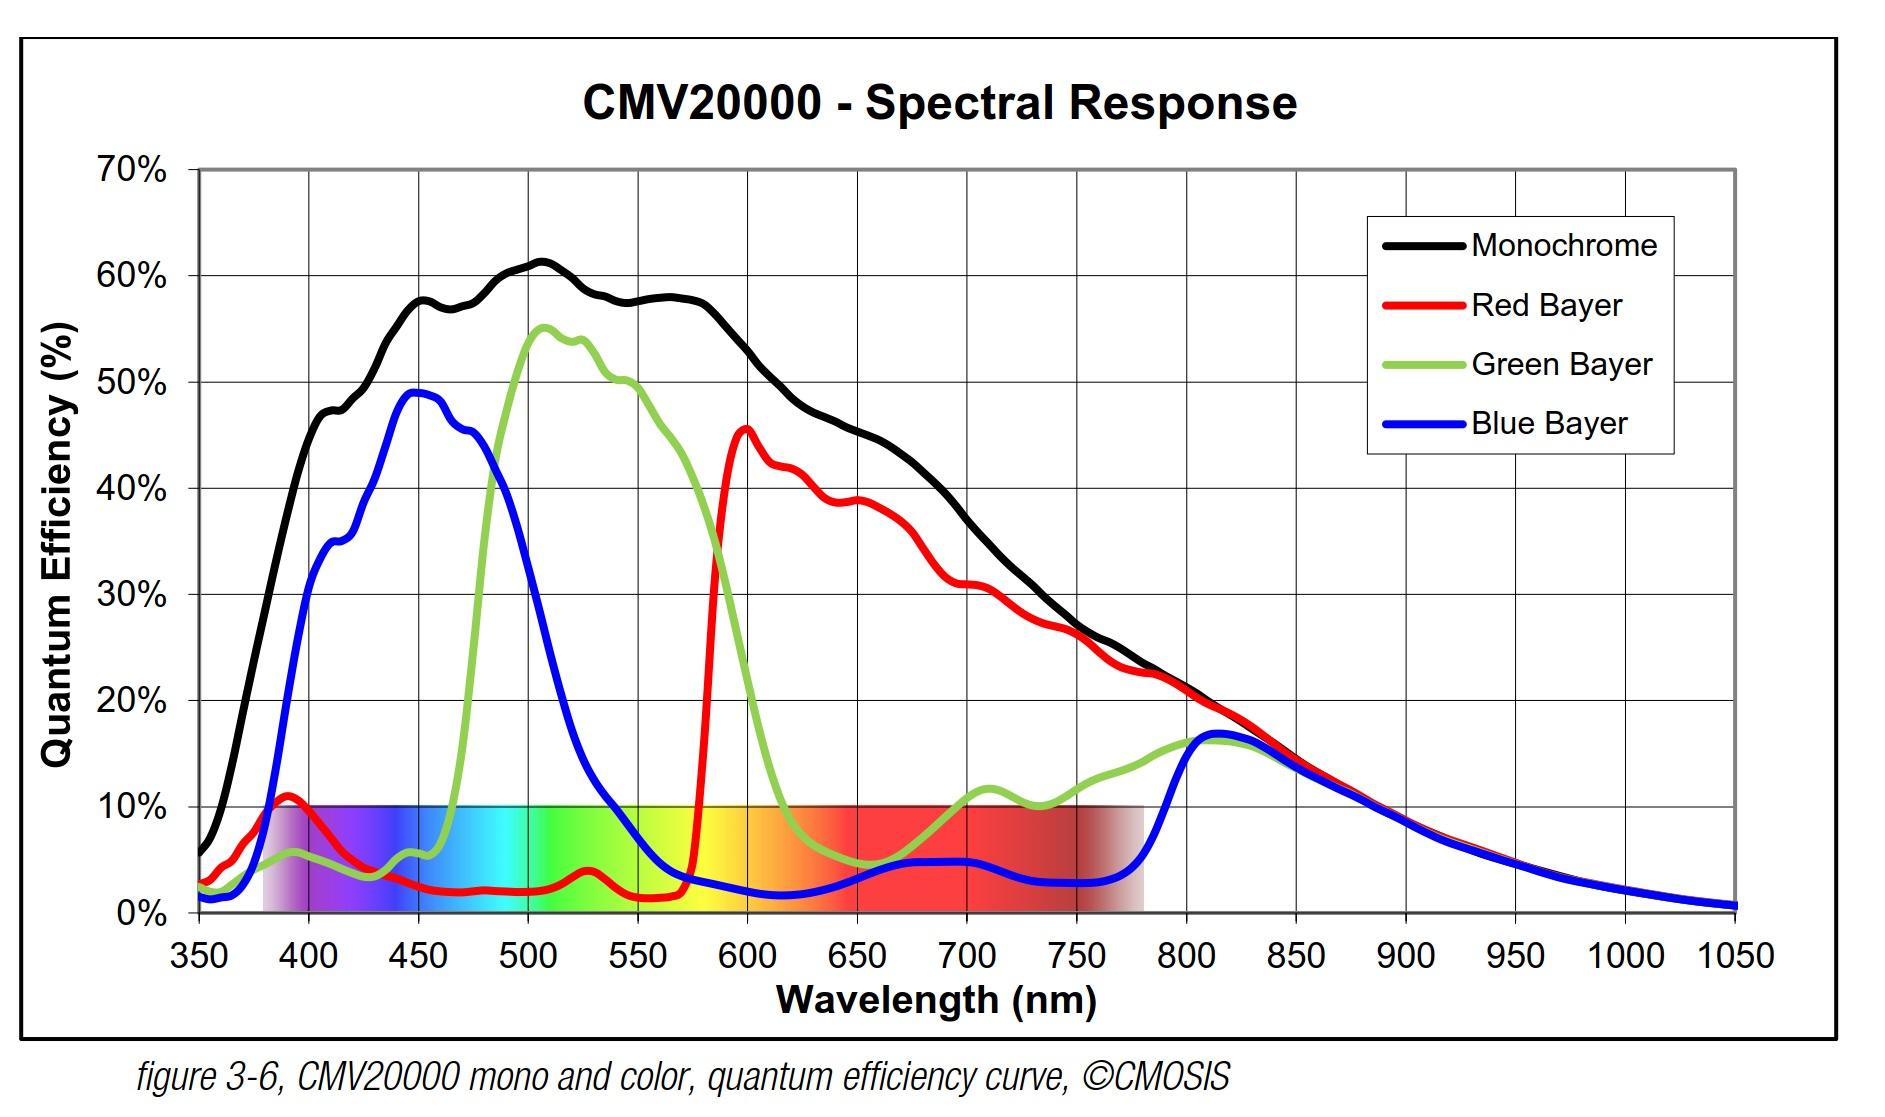 mono wiring diagram 2005 nissan altima ignition pci express camera - xib ximea support